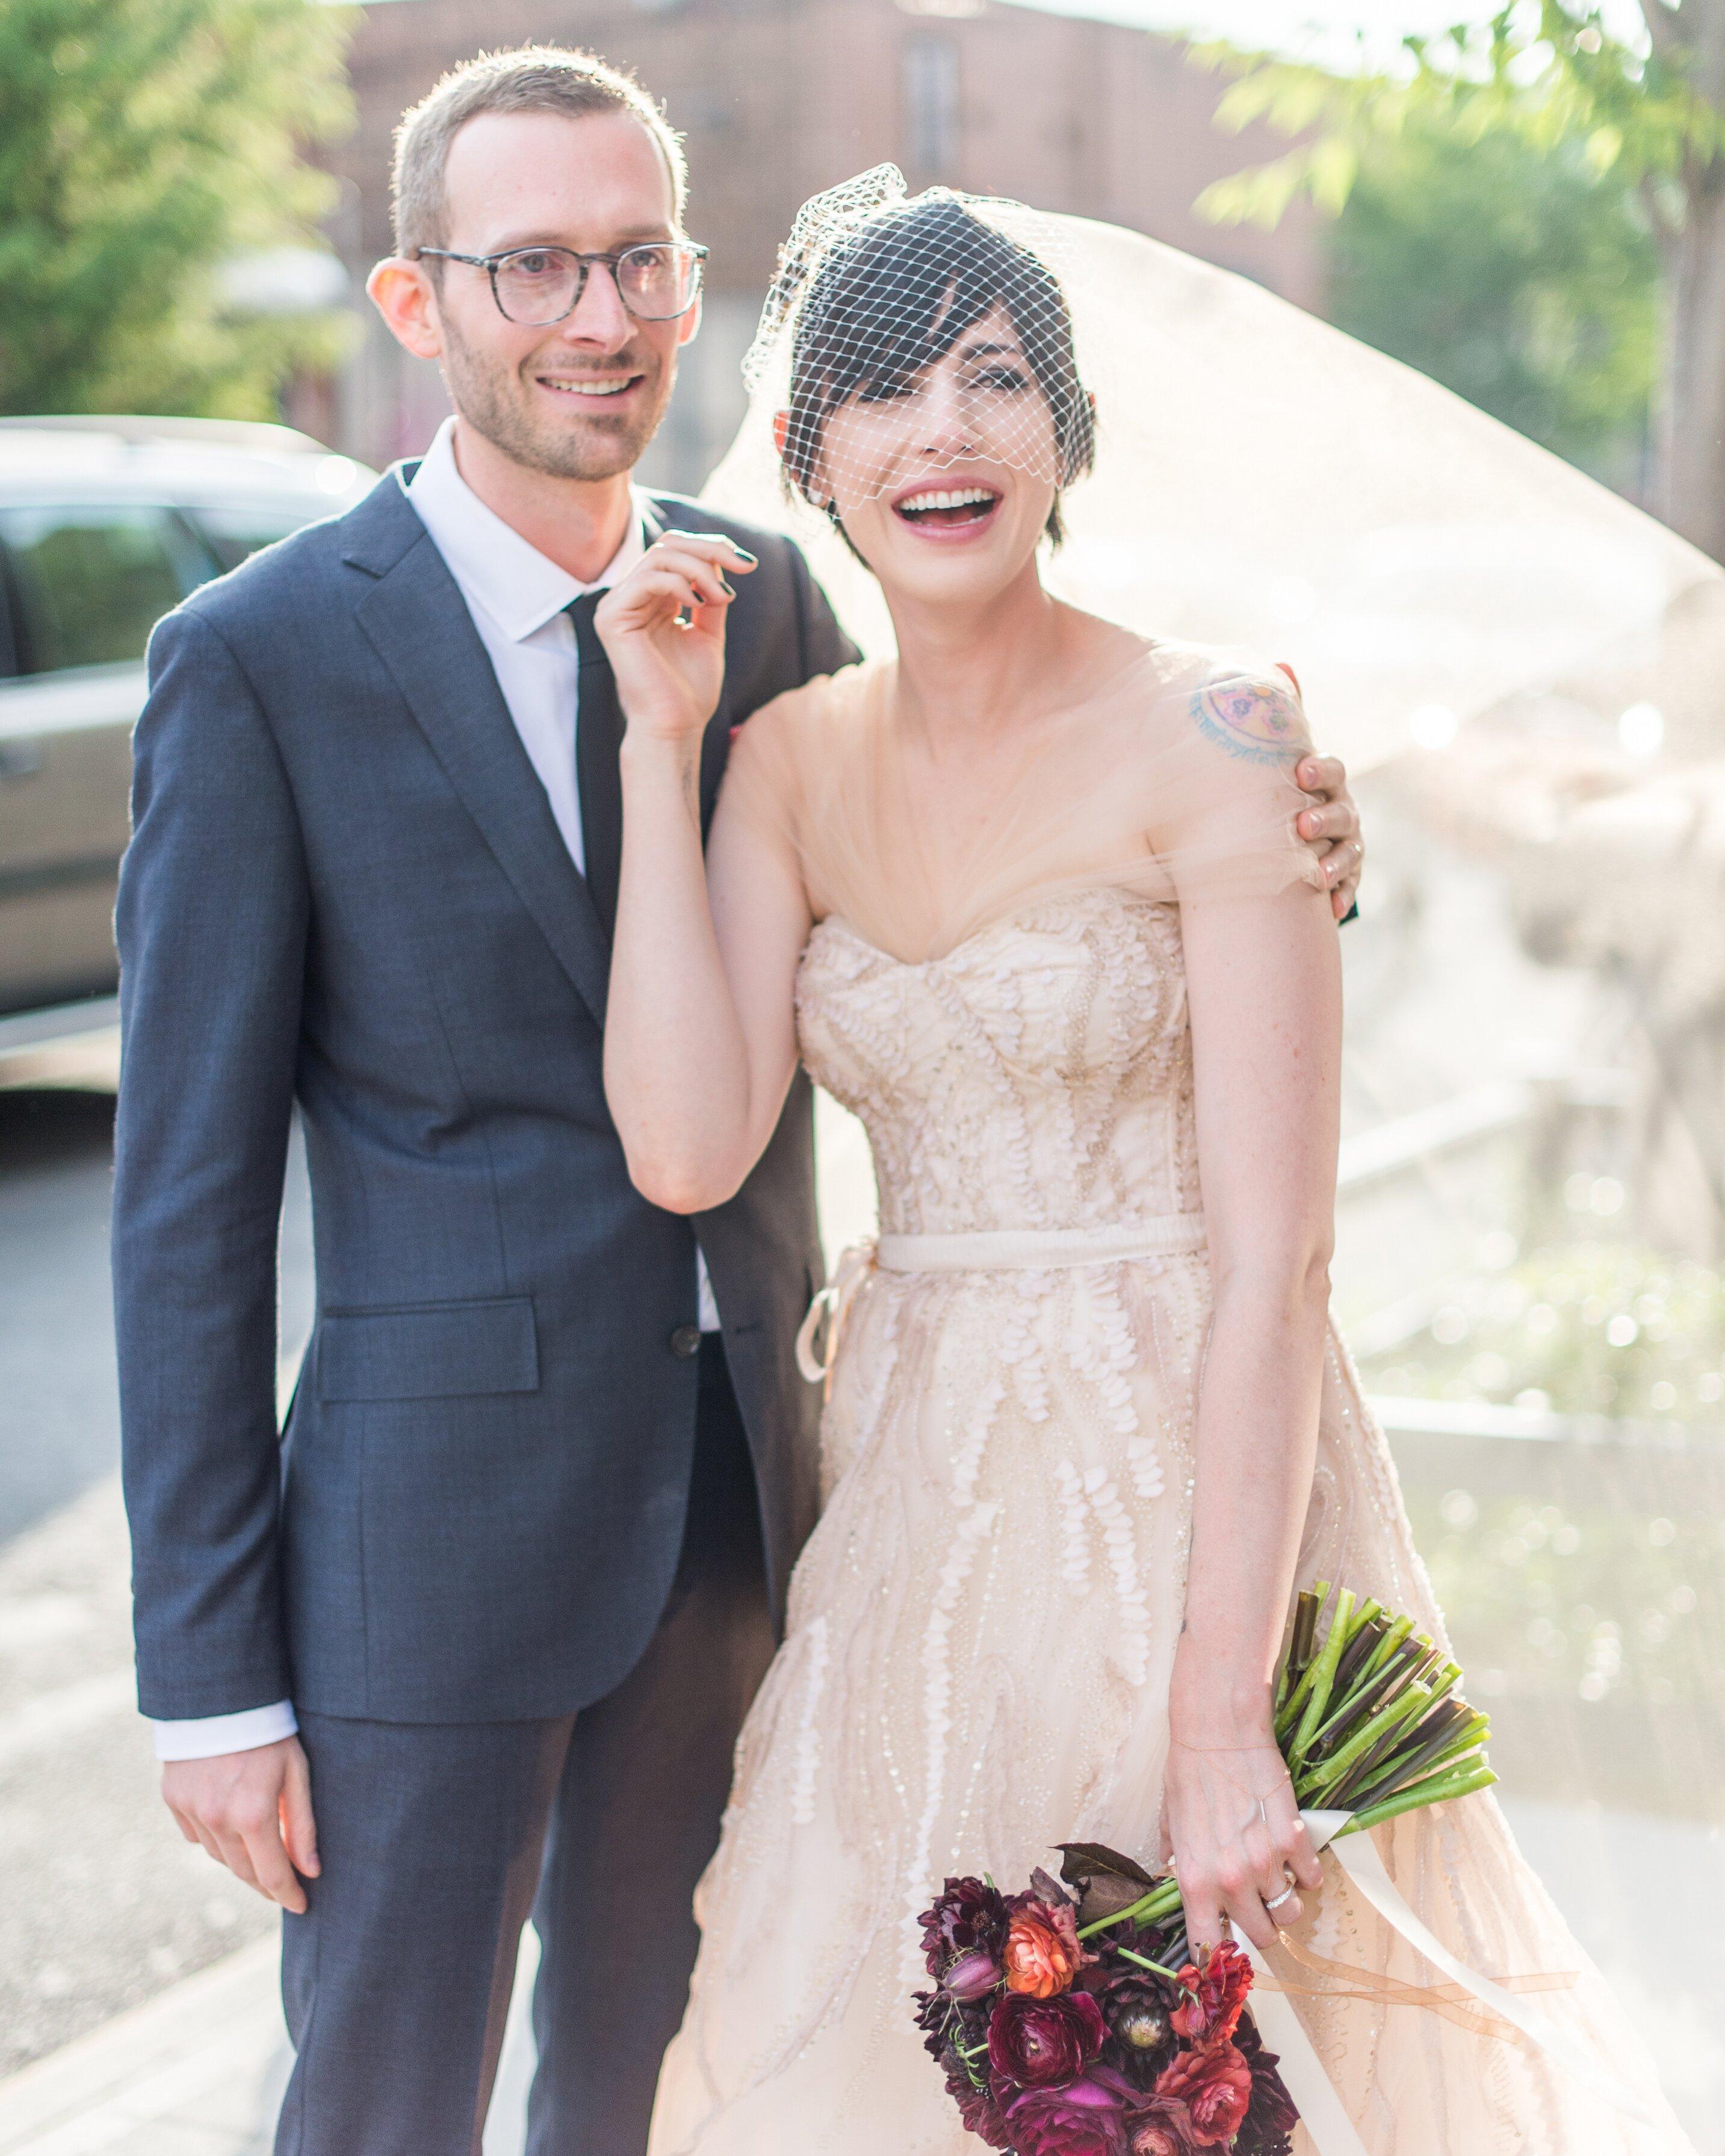 Chic Wedding Hairstyles For Short Hair Martha Stewart Weddings